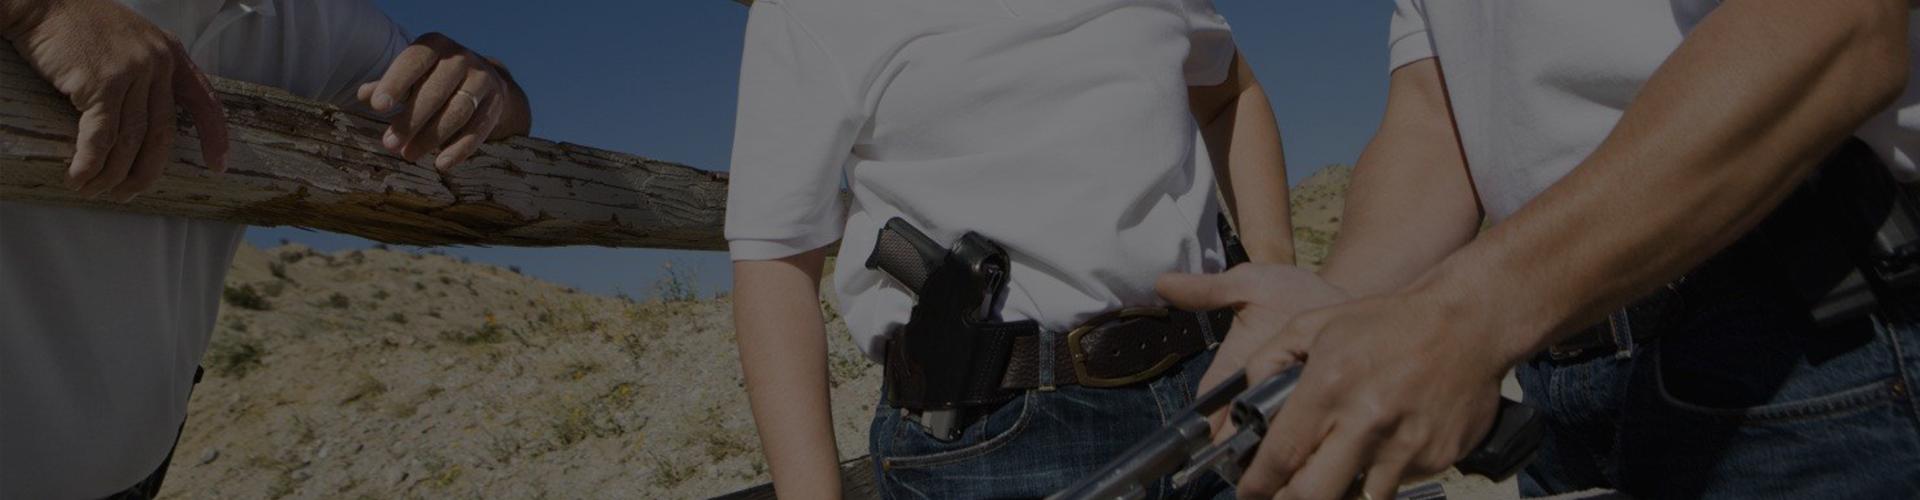 Professional Firearms Training in Orange County   OC